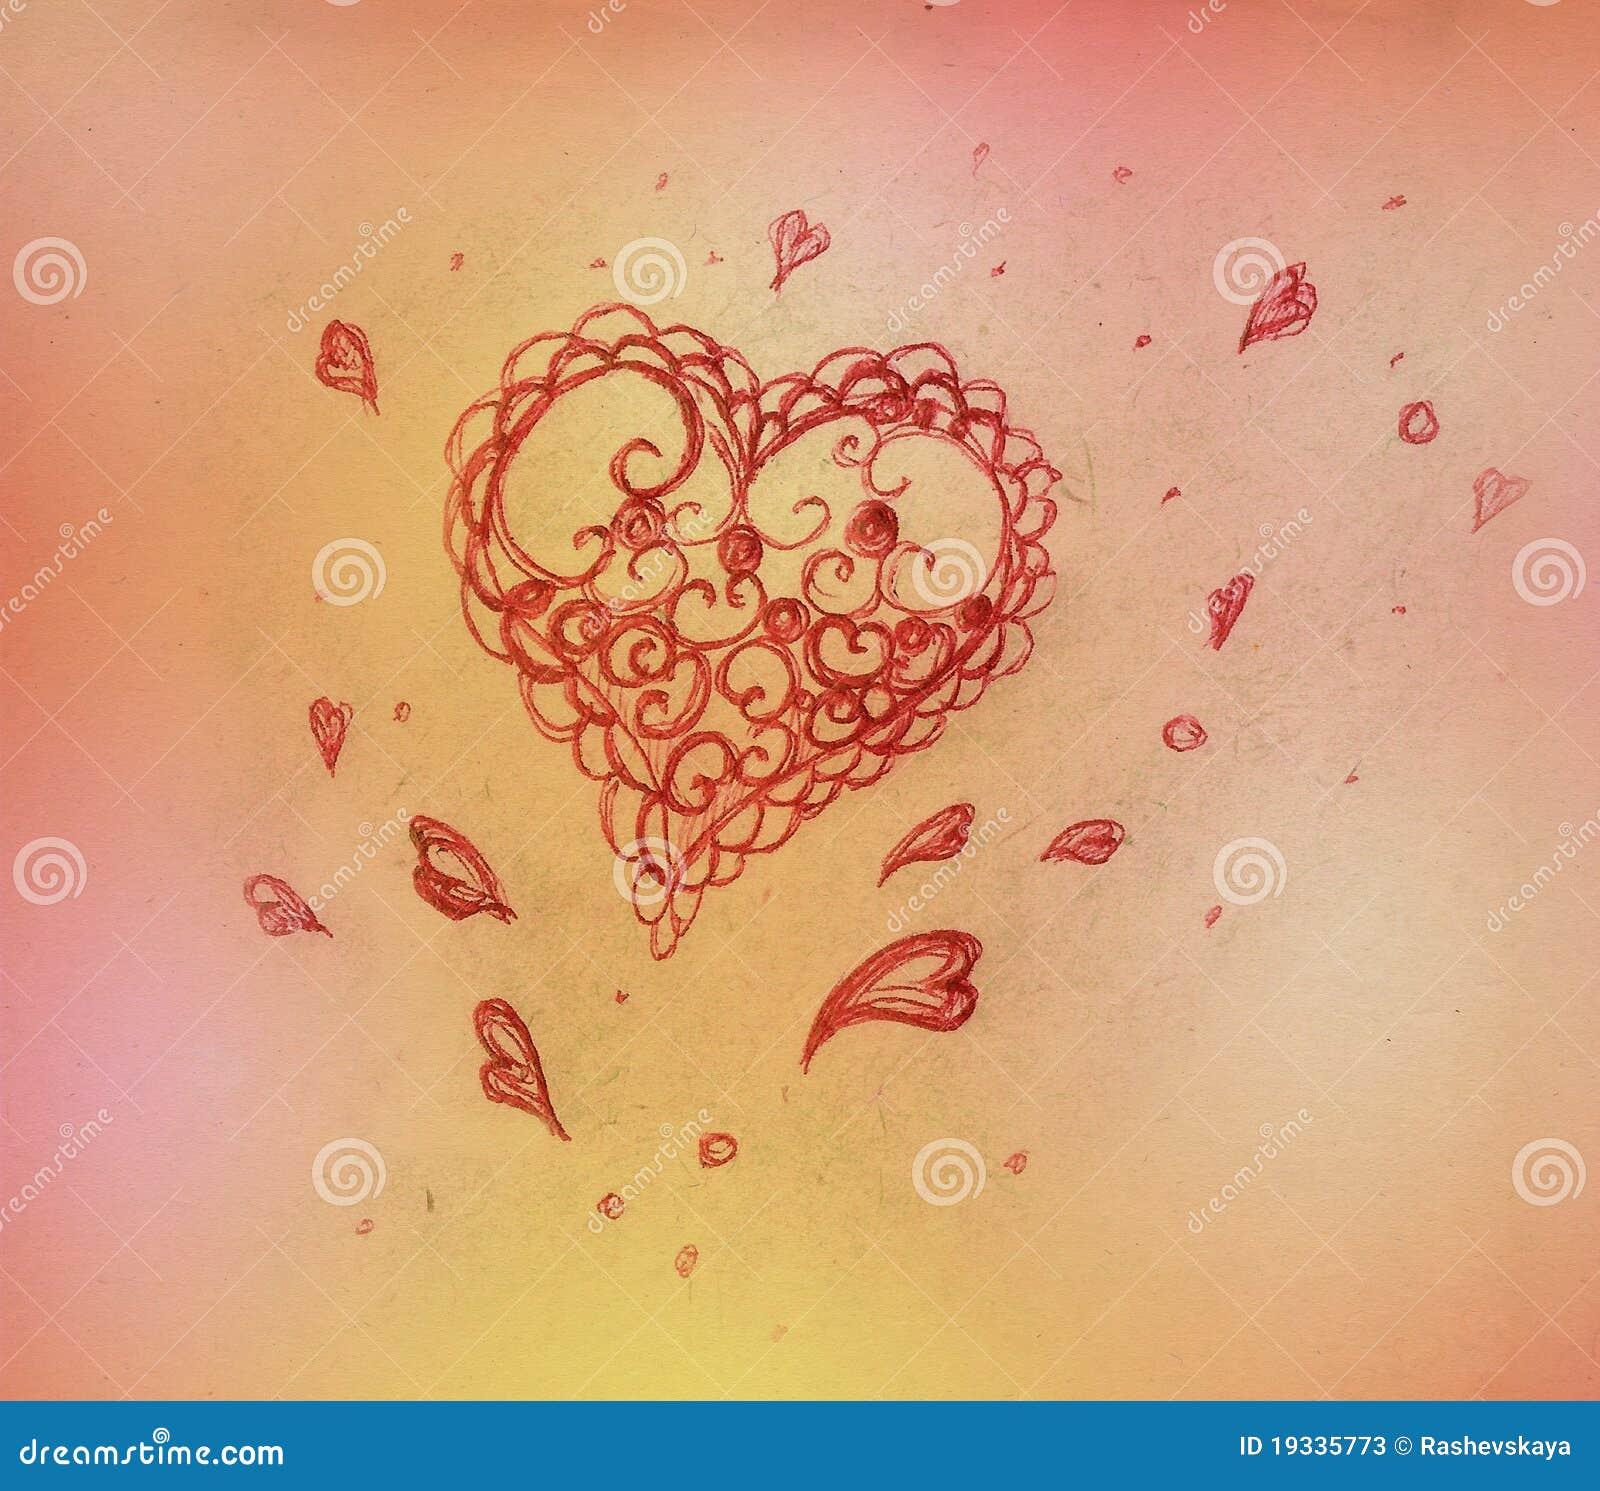 Heart, pencil drawing